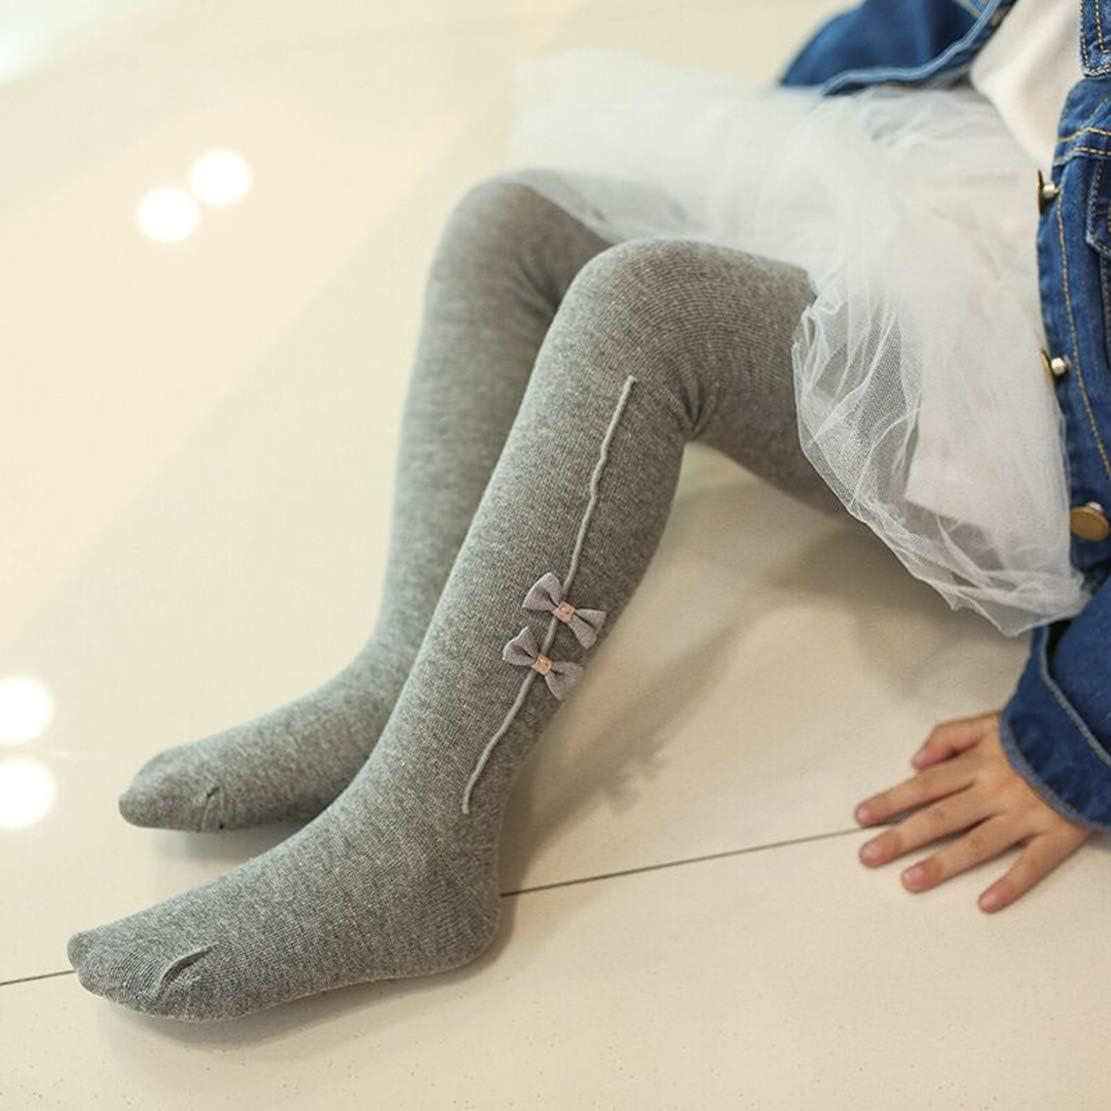 Gaga city Calzamaglia Bambino Invernali Caldo Cotone Collant Termico Bambina Ragazza Elastico Leggings Calze Maglia Bow 0-4anni